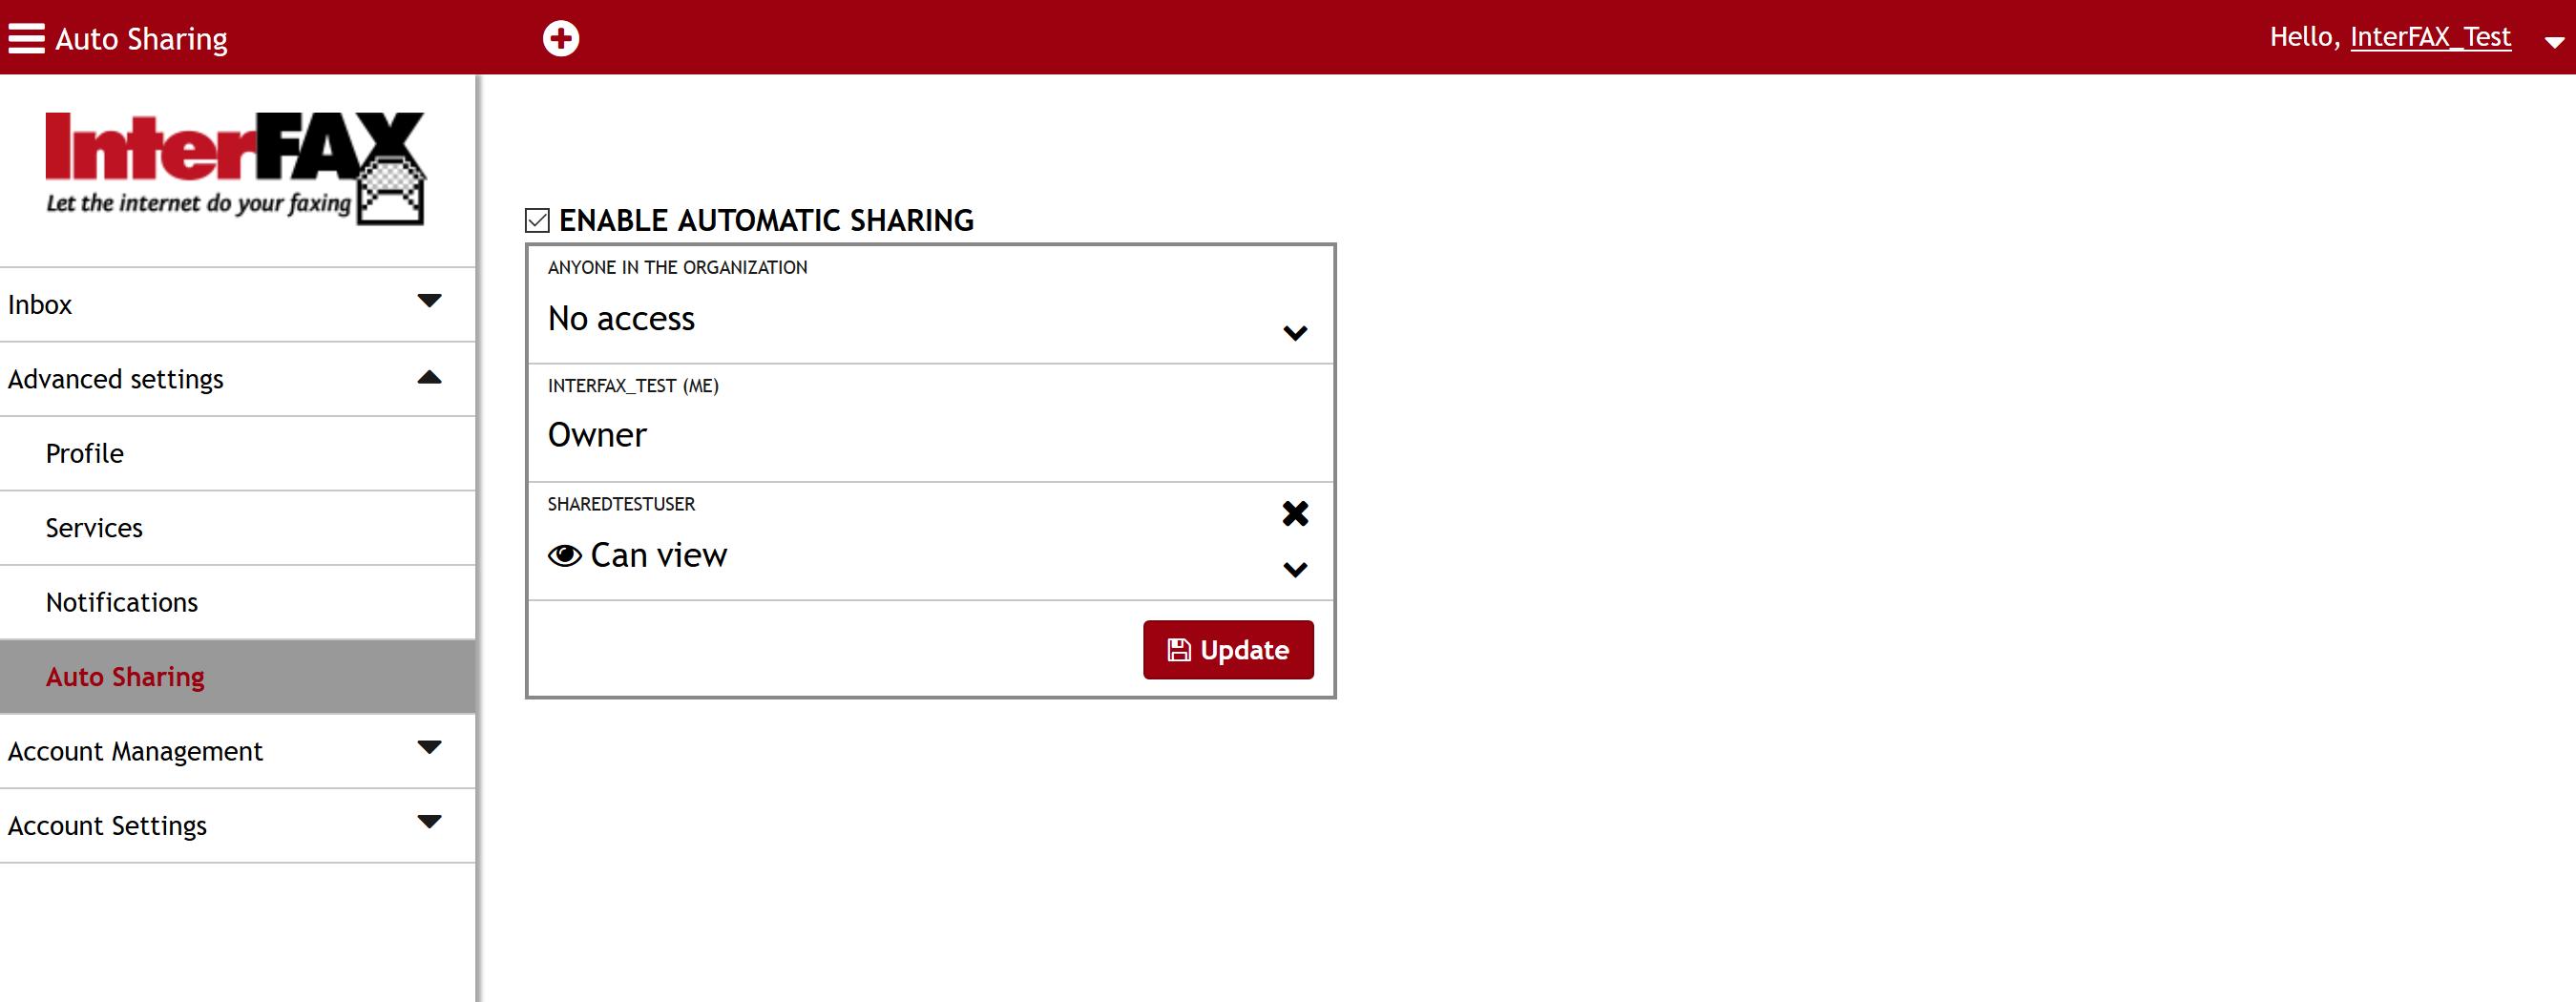 Auto Sharing User Added Window